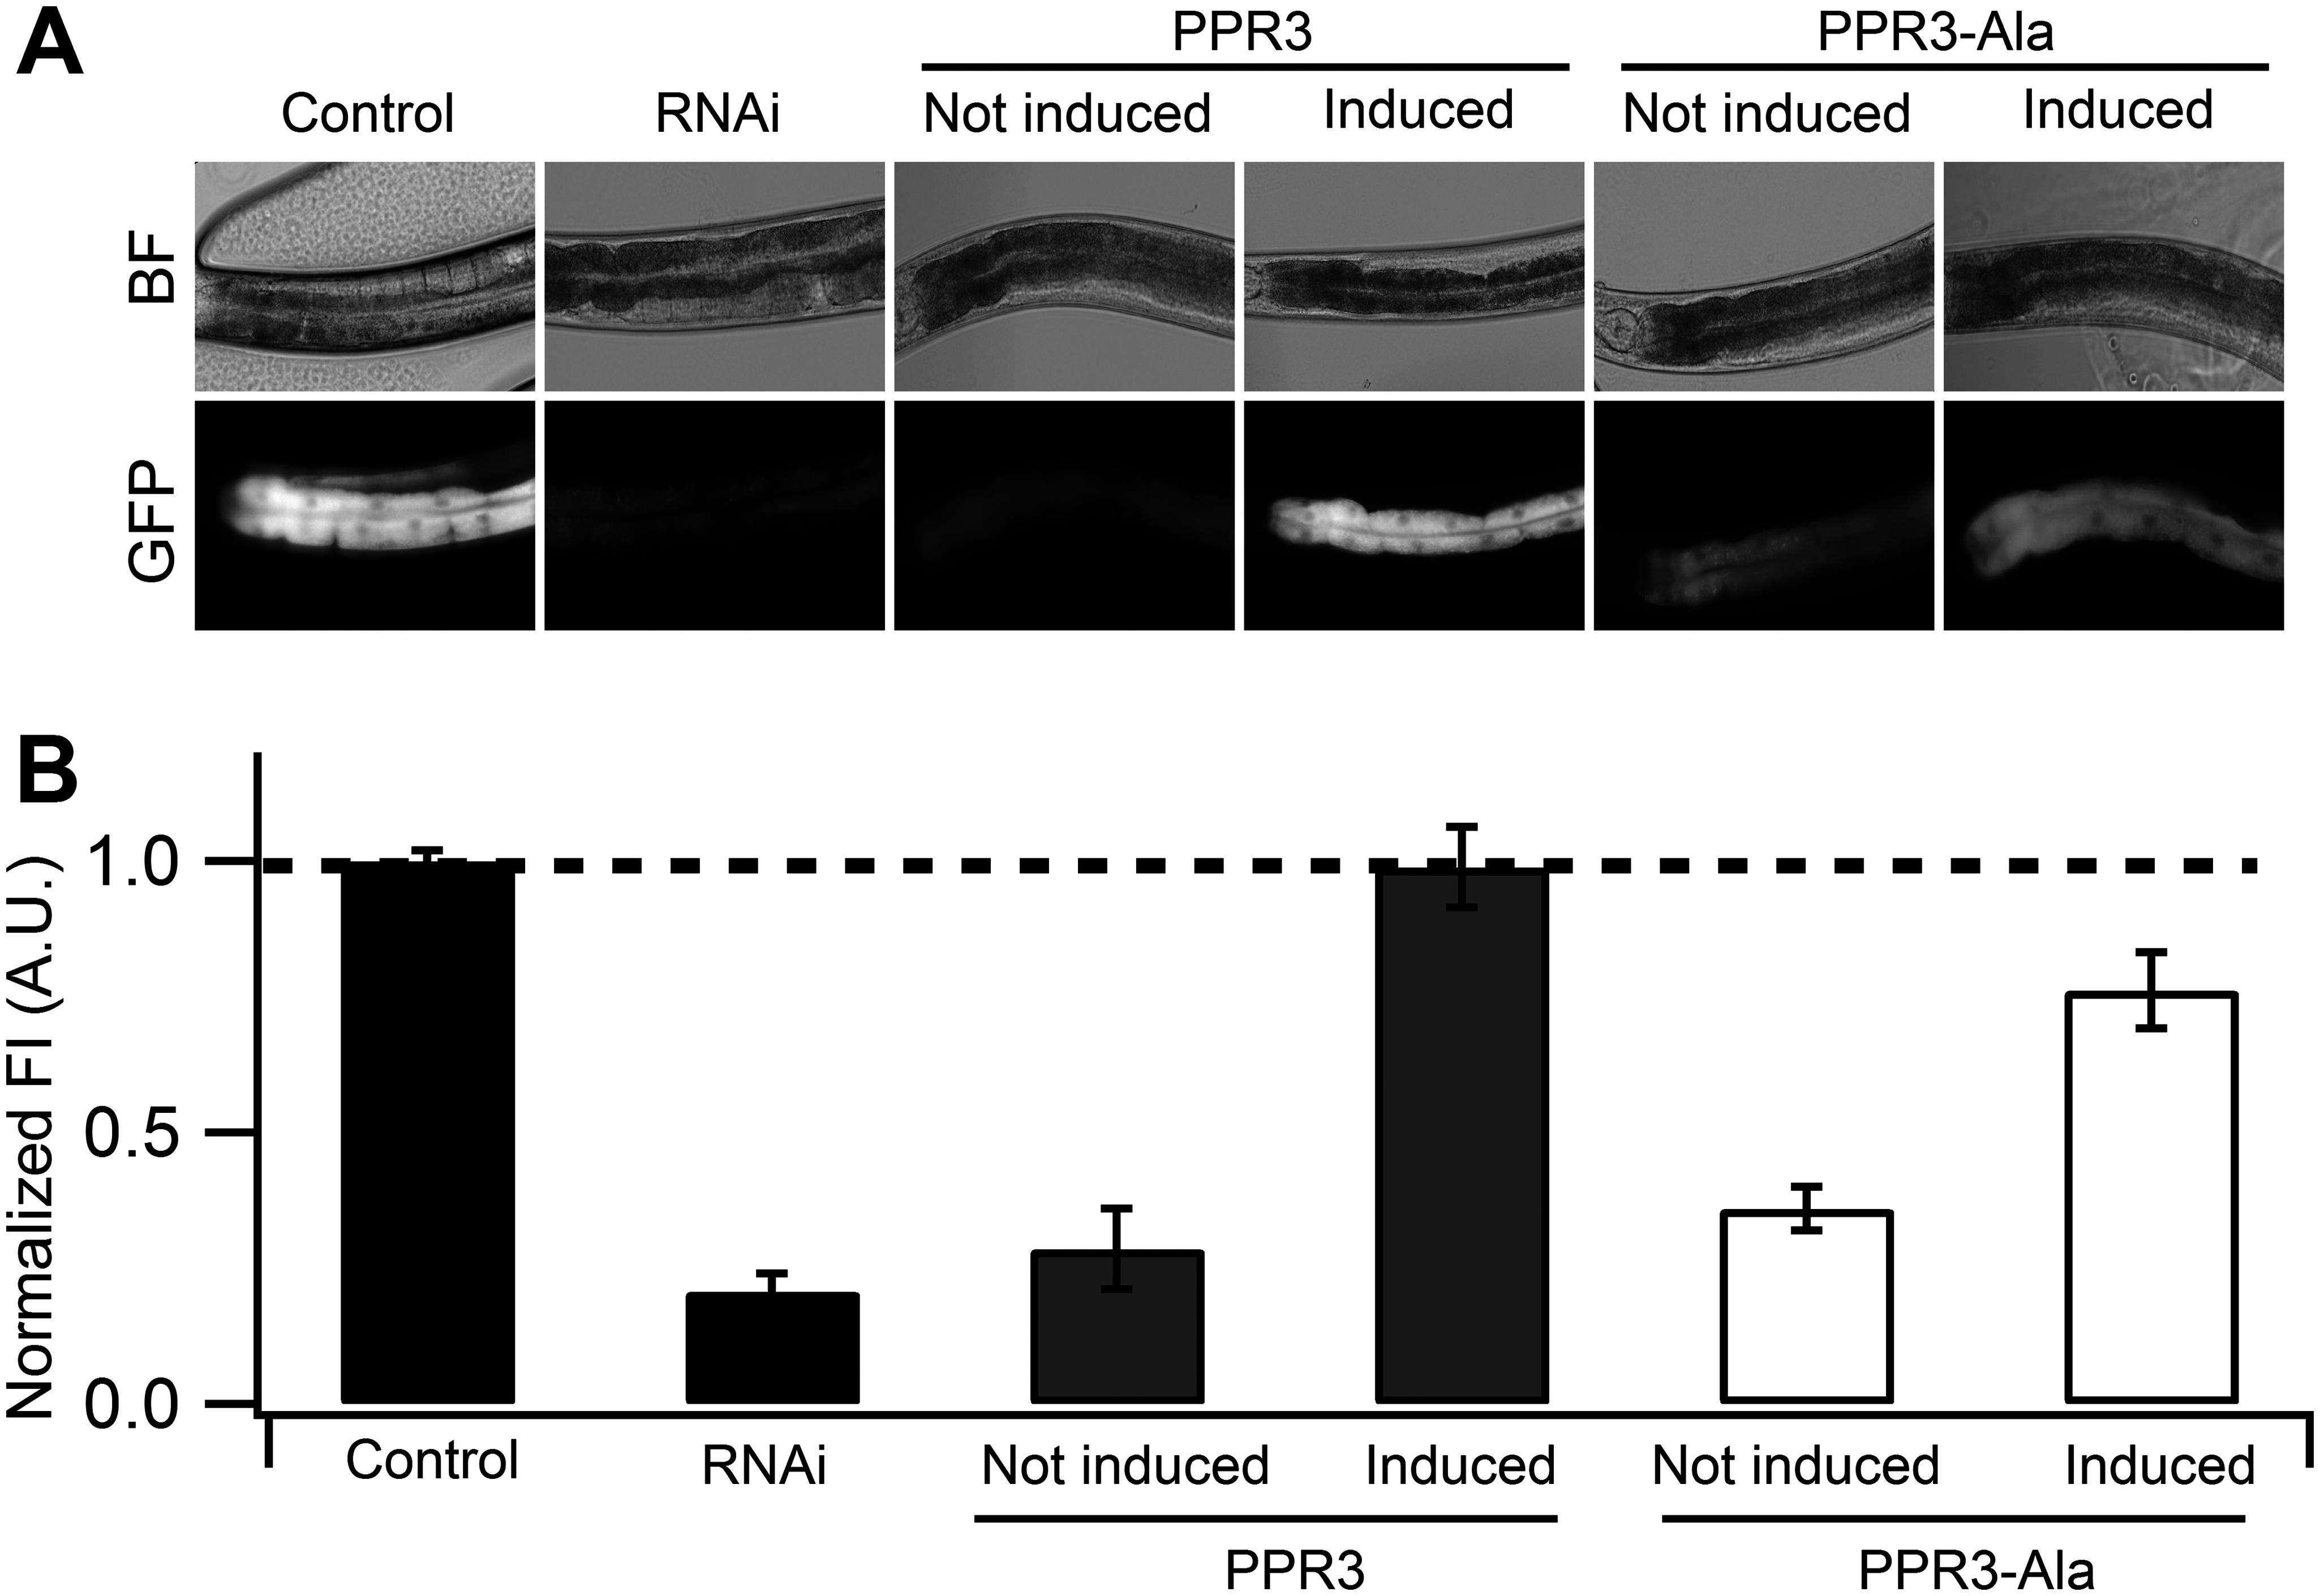 Suppression of RNAi in <i>C</i>. <i>elegans</i> by PPR3 and PPR3-Ala.